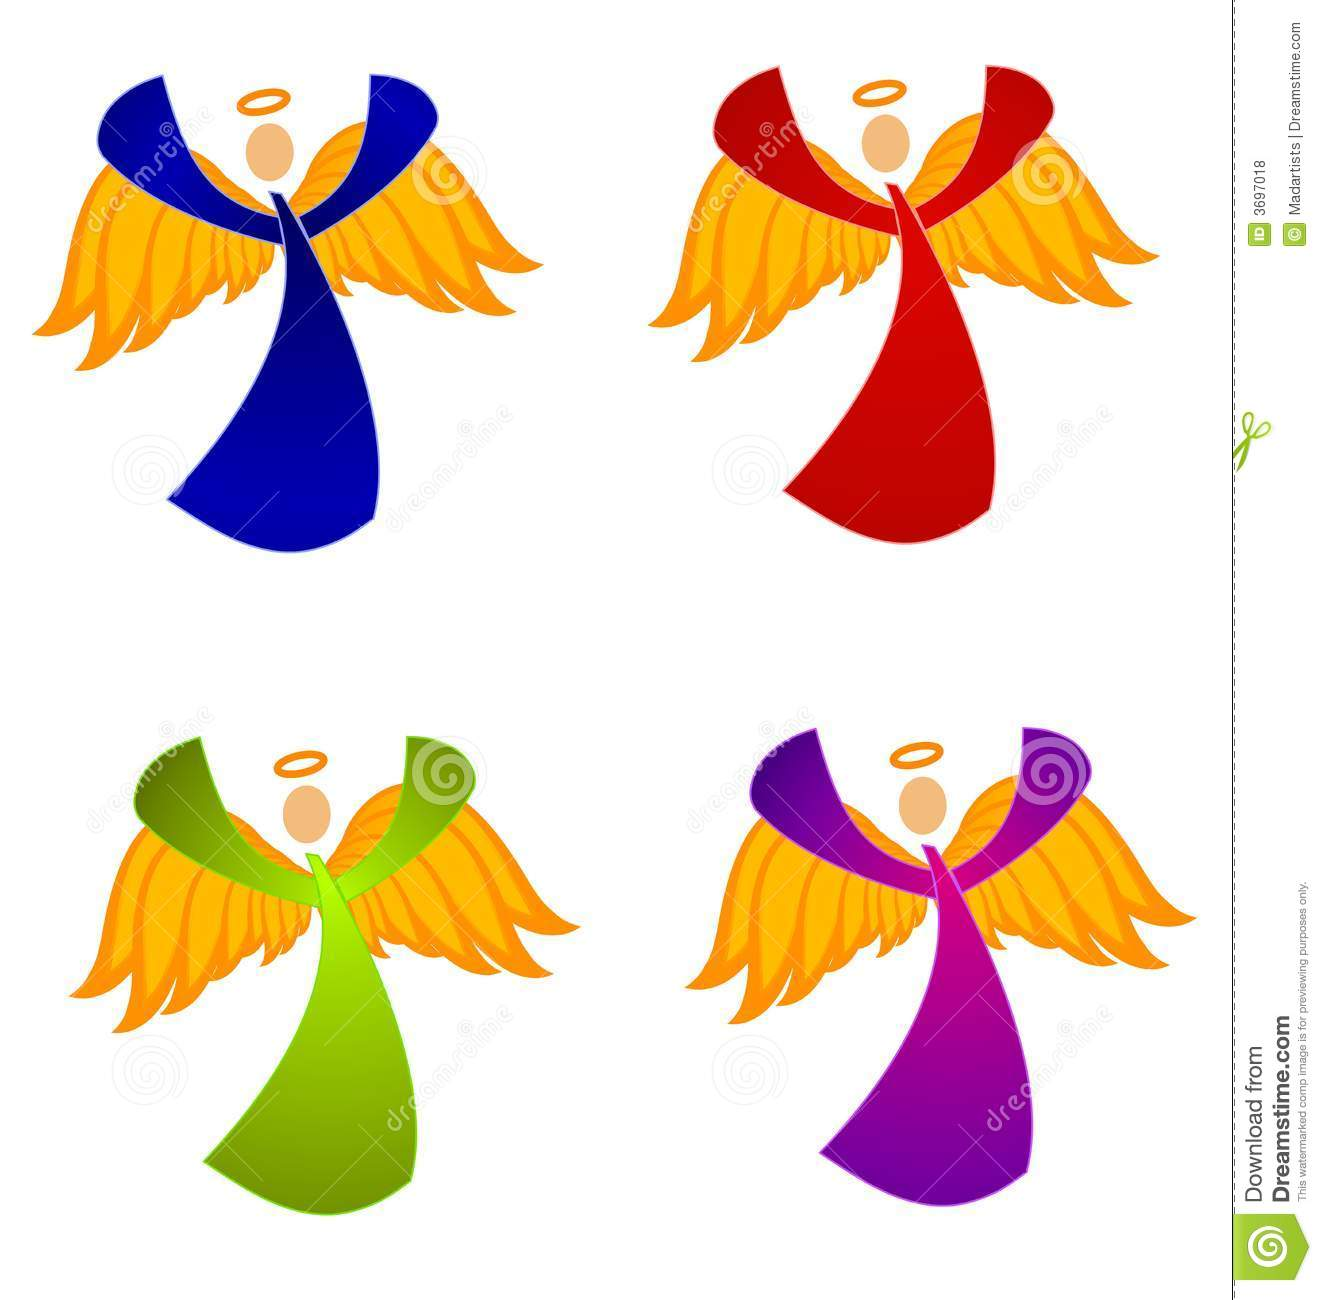 Religious Christmas Clipart U0026middot;-religious christmas clipart u0026middot; variety clipart-15